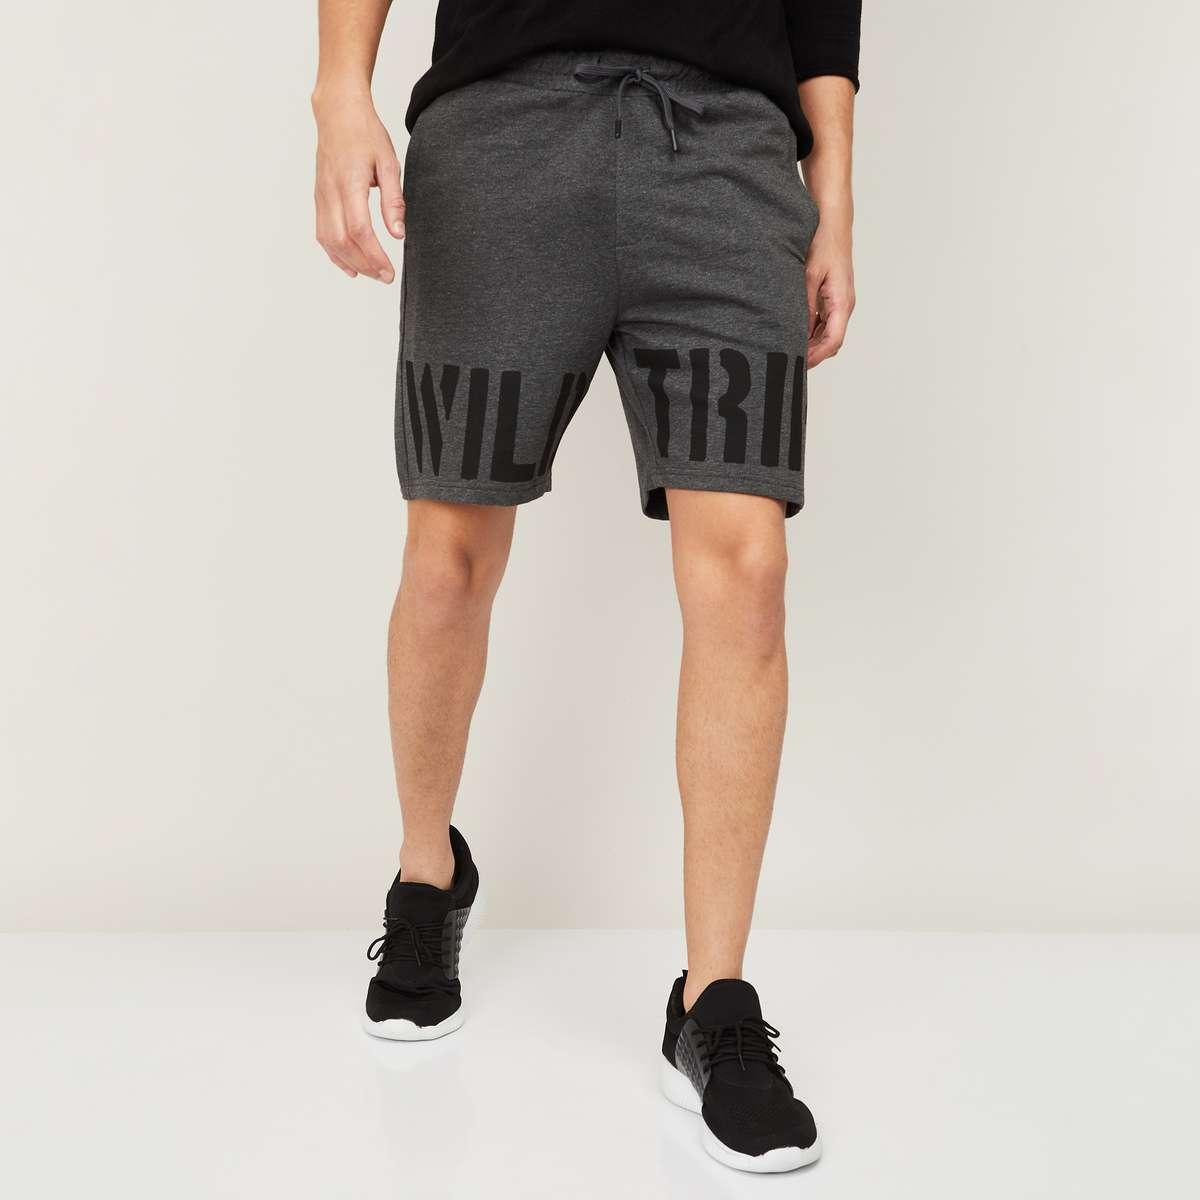 1.FORCA Men Printed Regular Fit Casual Shorts